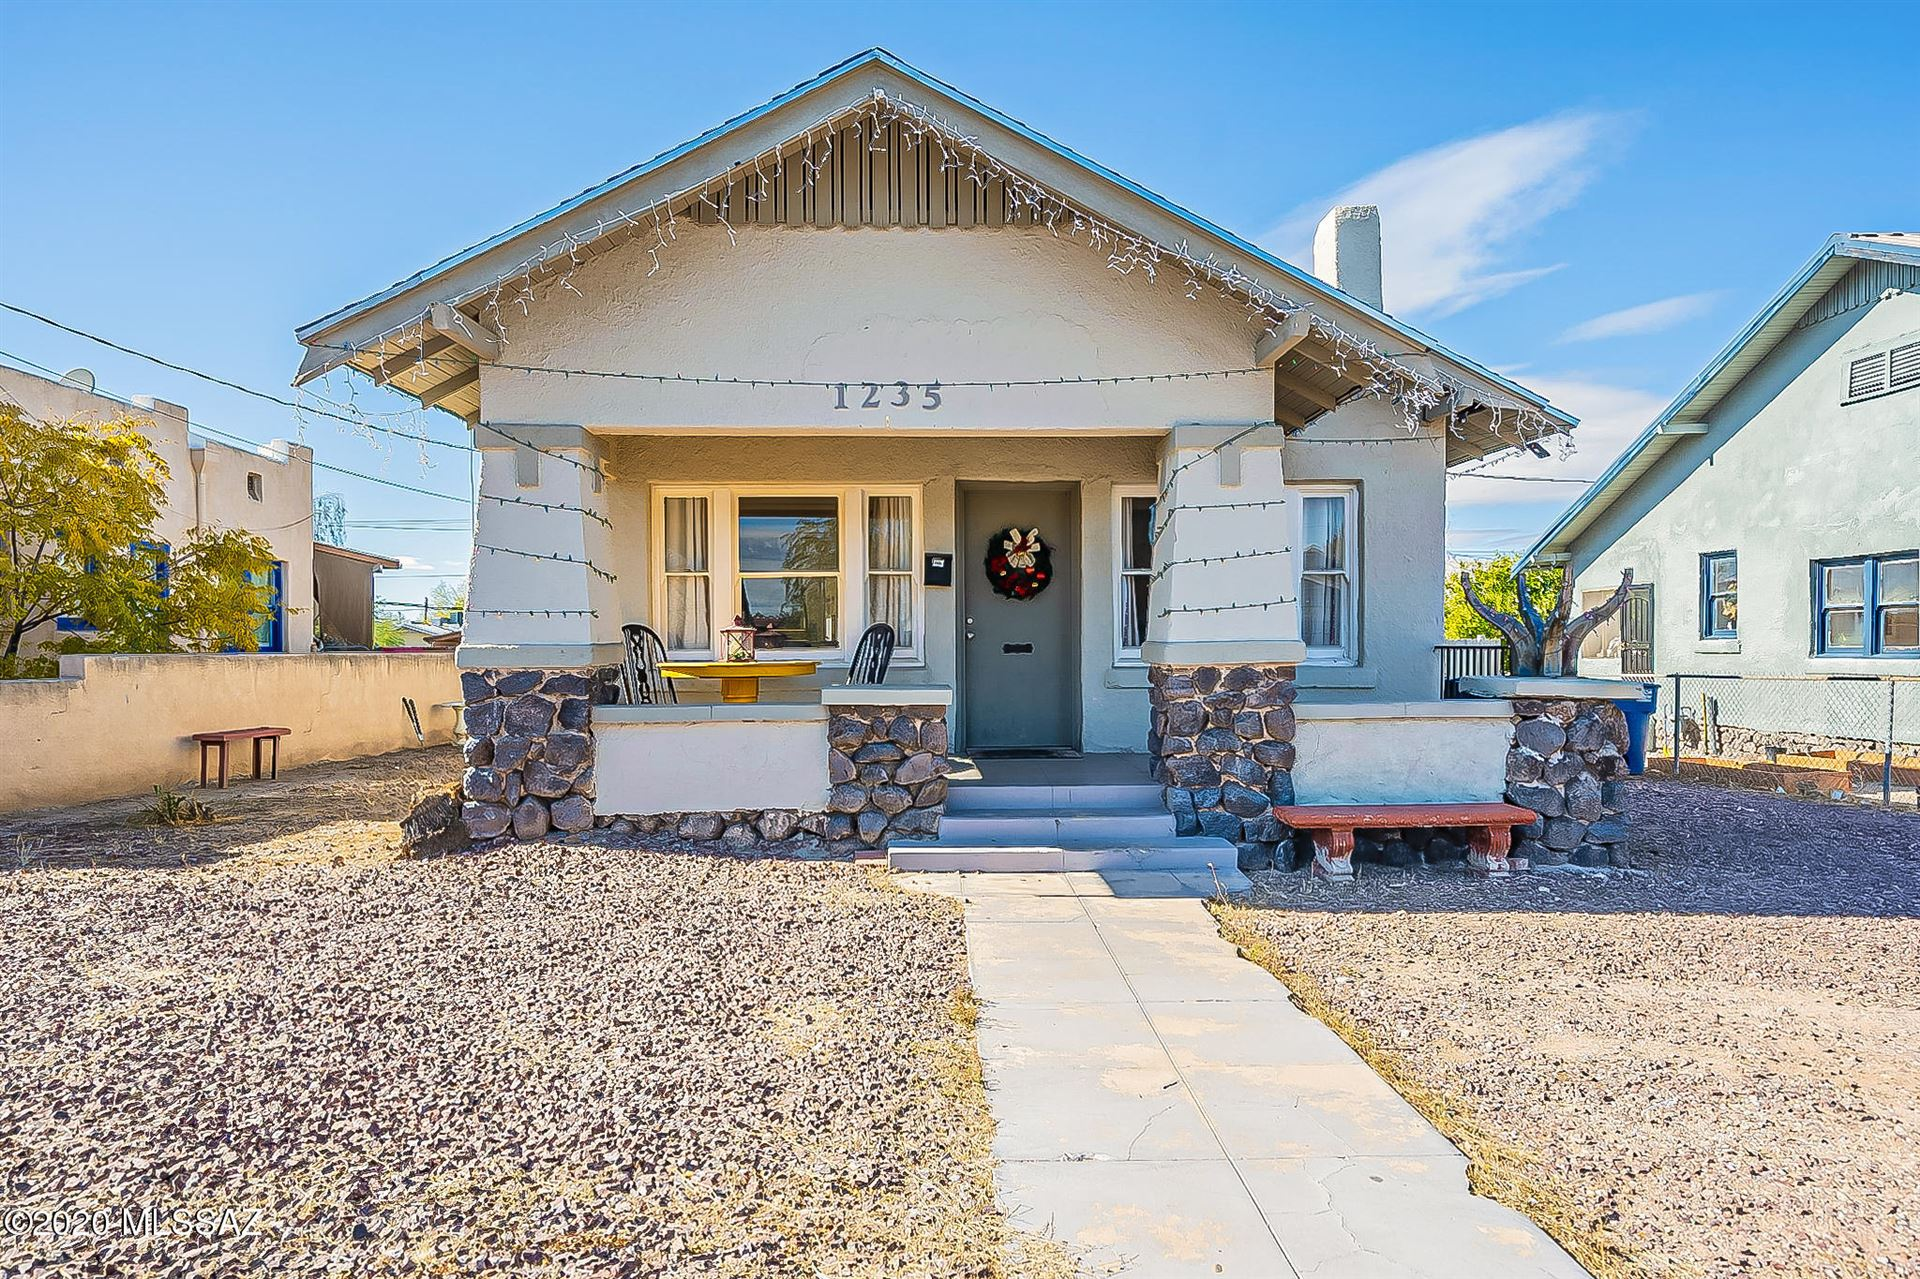 1235 N Euclid Avenue, Tucson, AZ 85719 - MLS#: 22030847